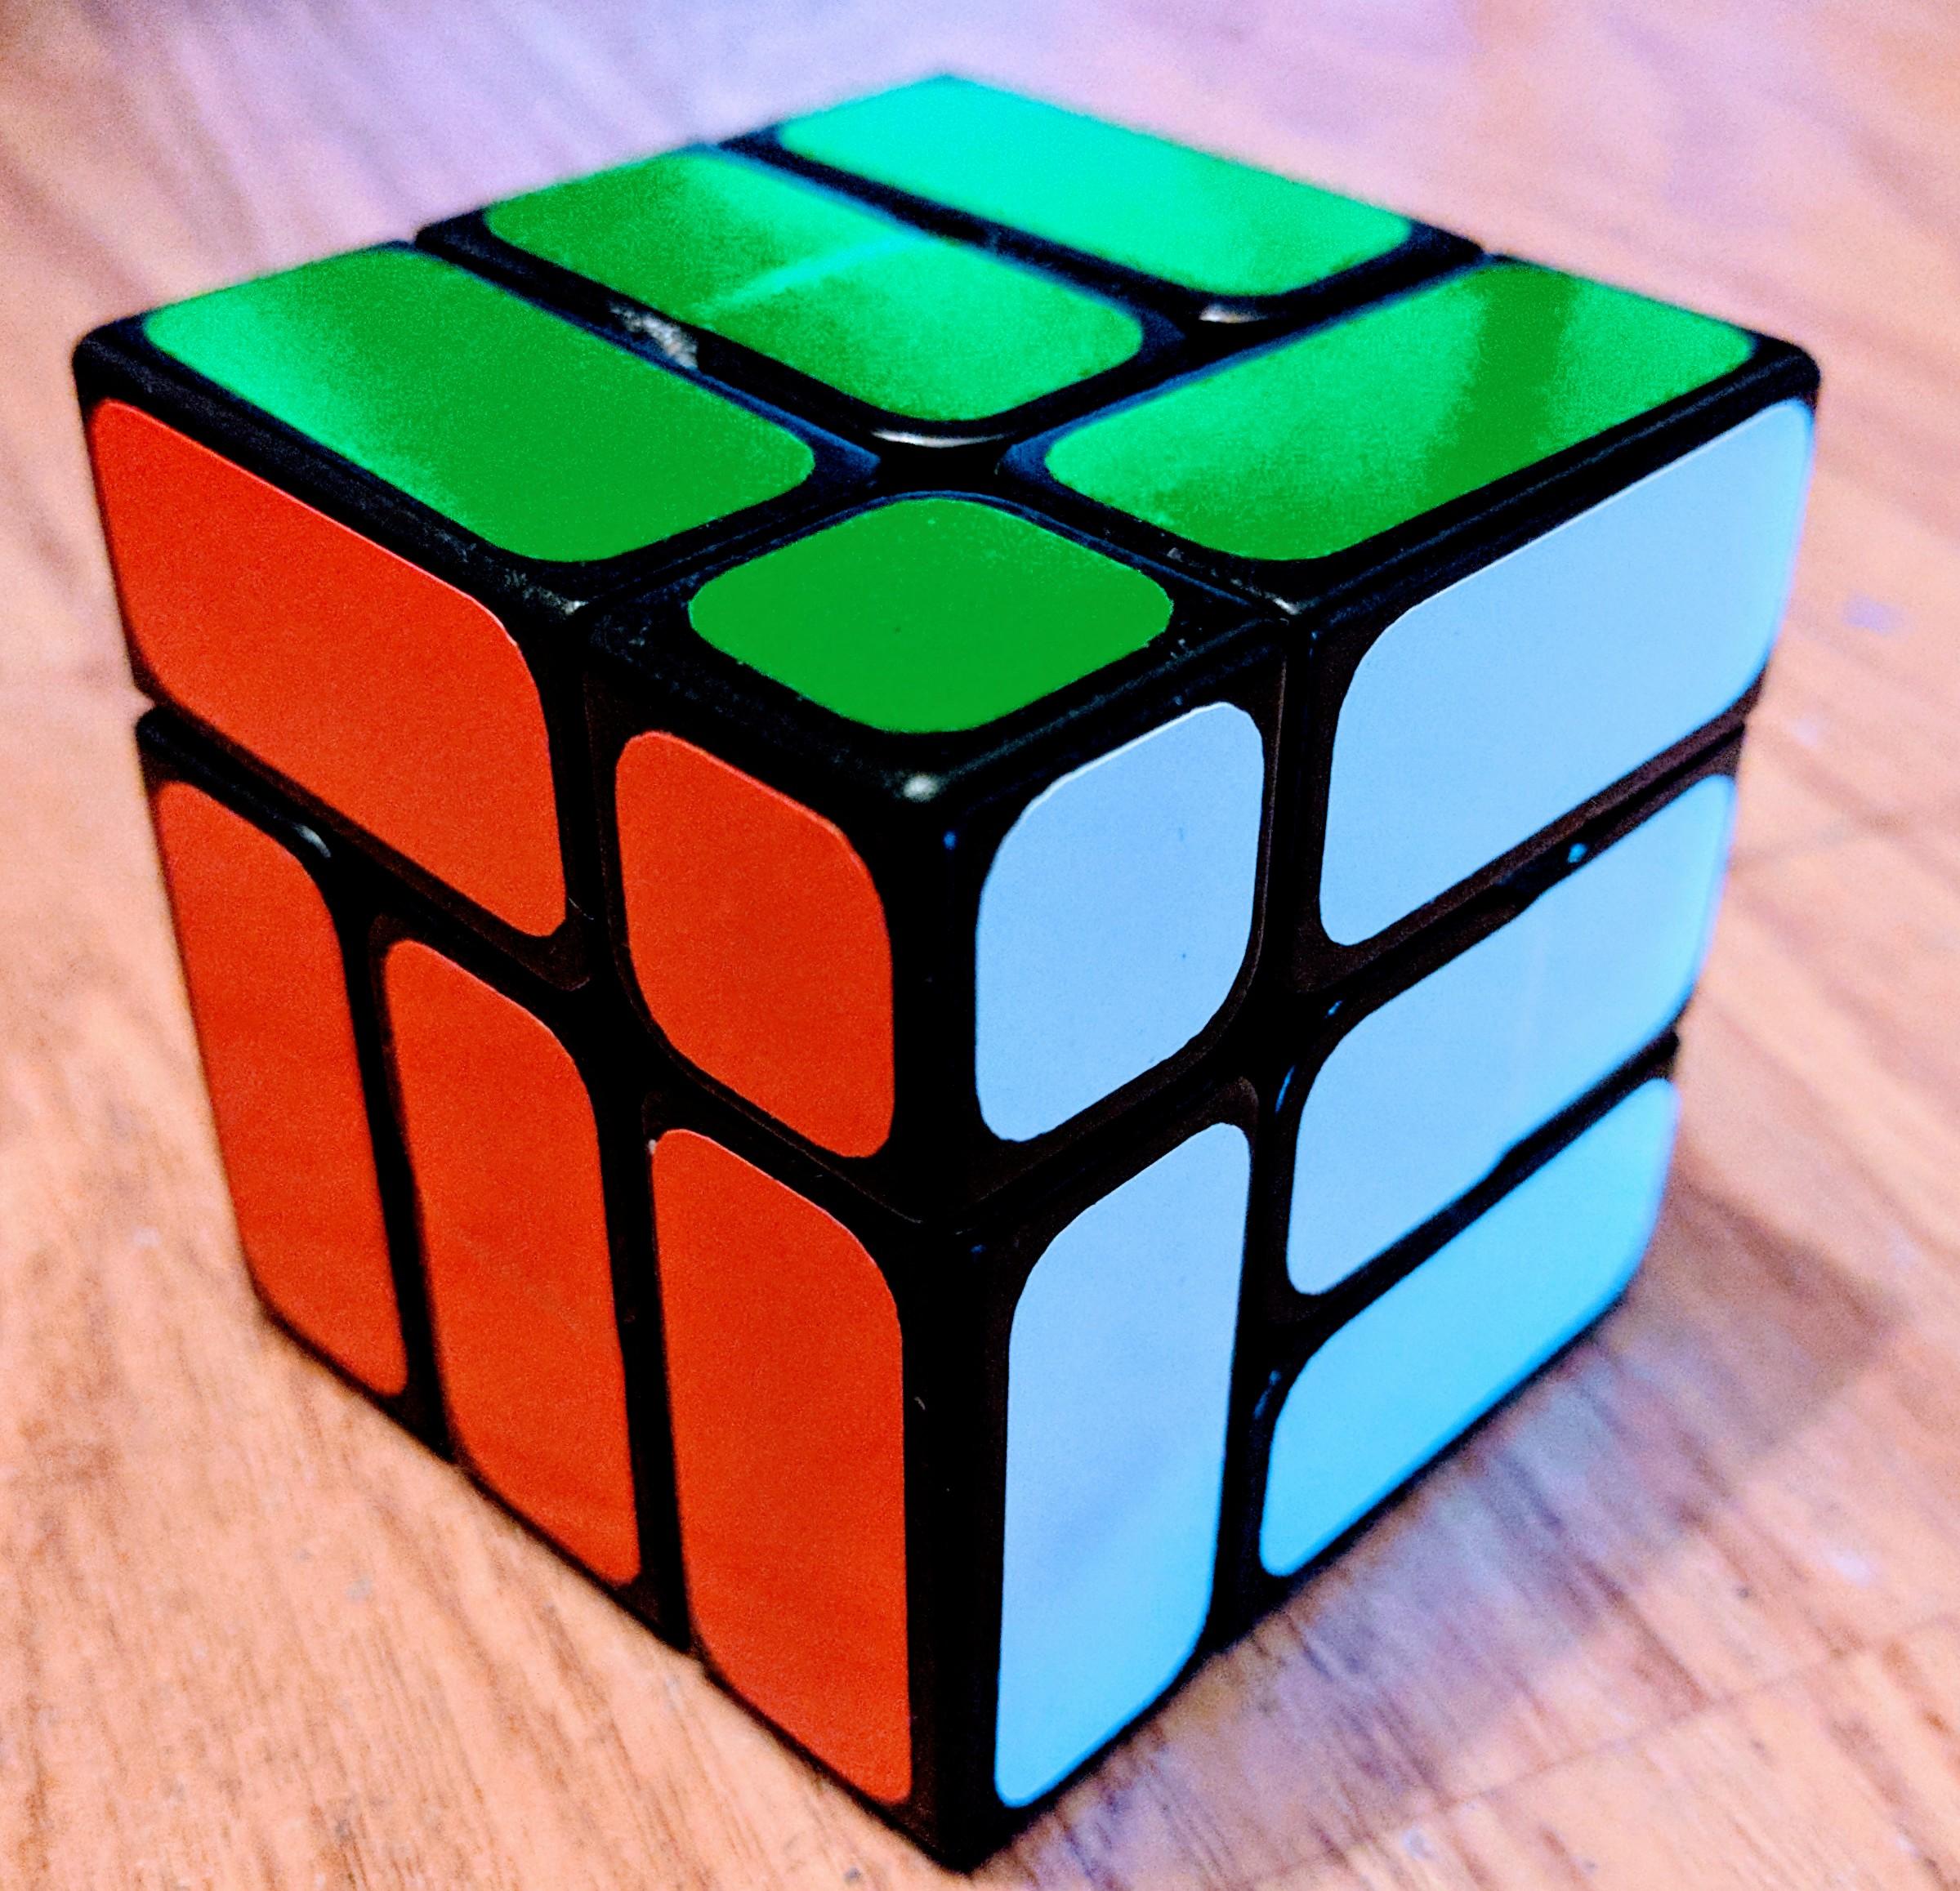 7 Cara Mudah dan Menyenangkan agar Anak Suka Matematika